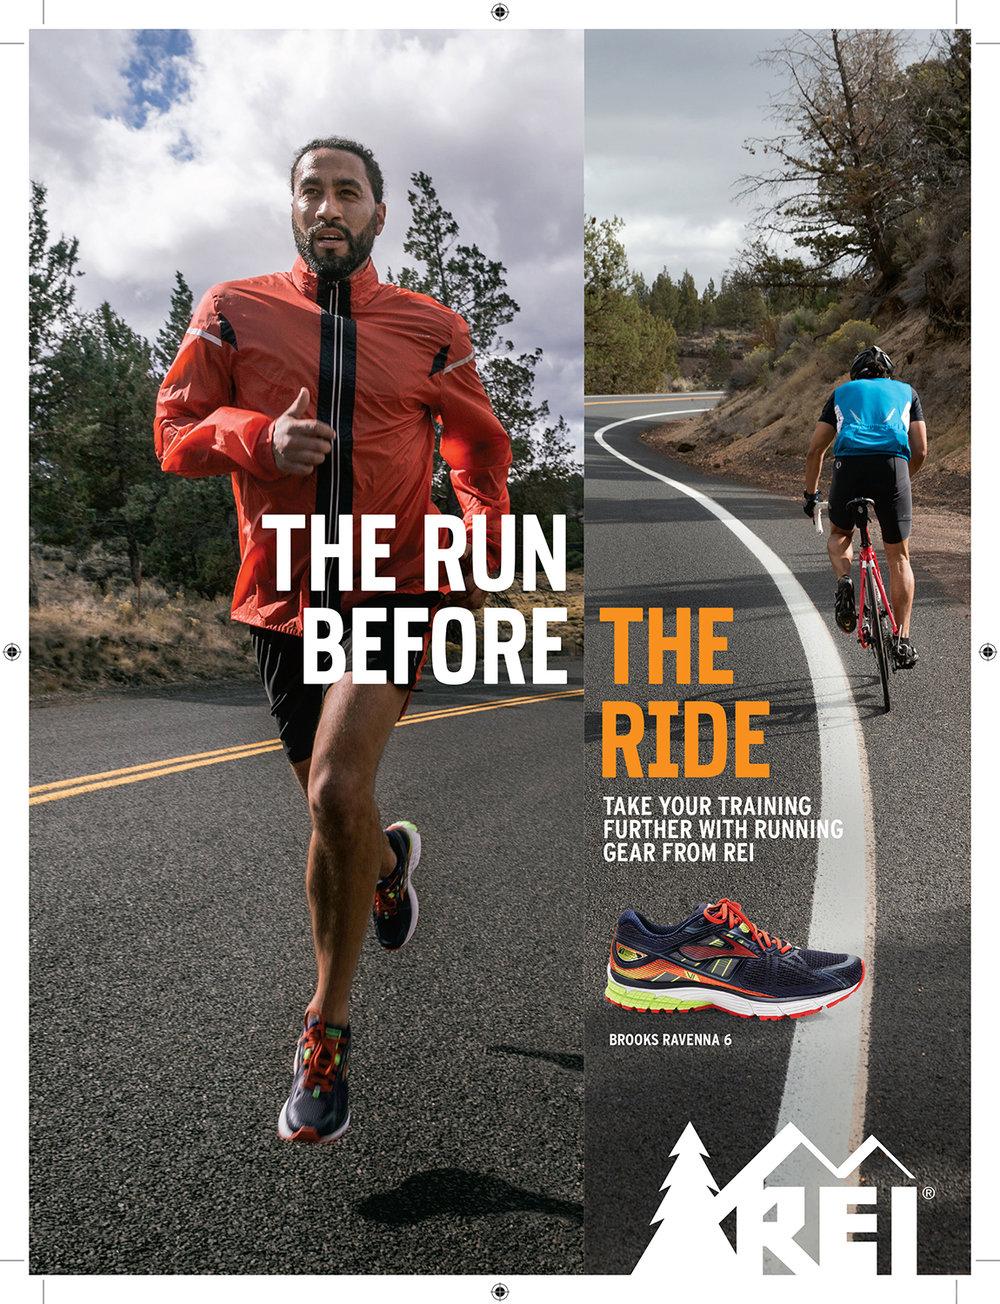 REI_MAG_FIT_RunnersWorld-MarApr15_7-875x10-5.jpg